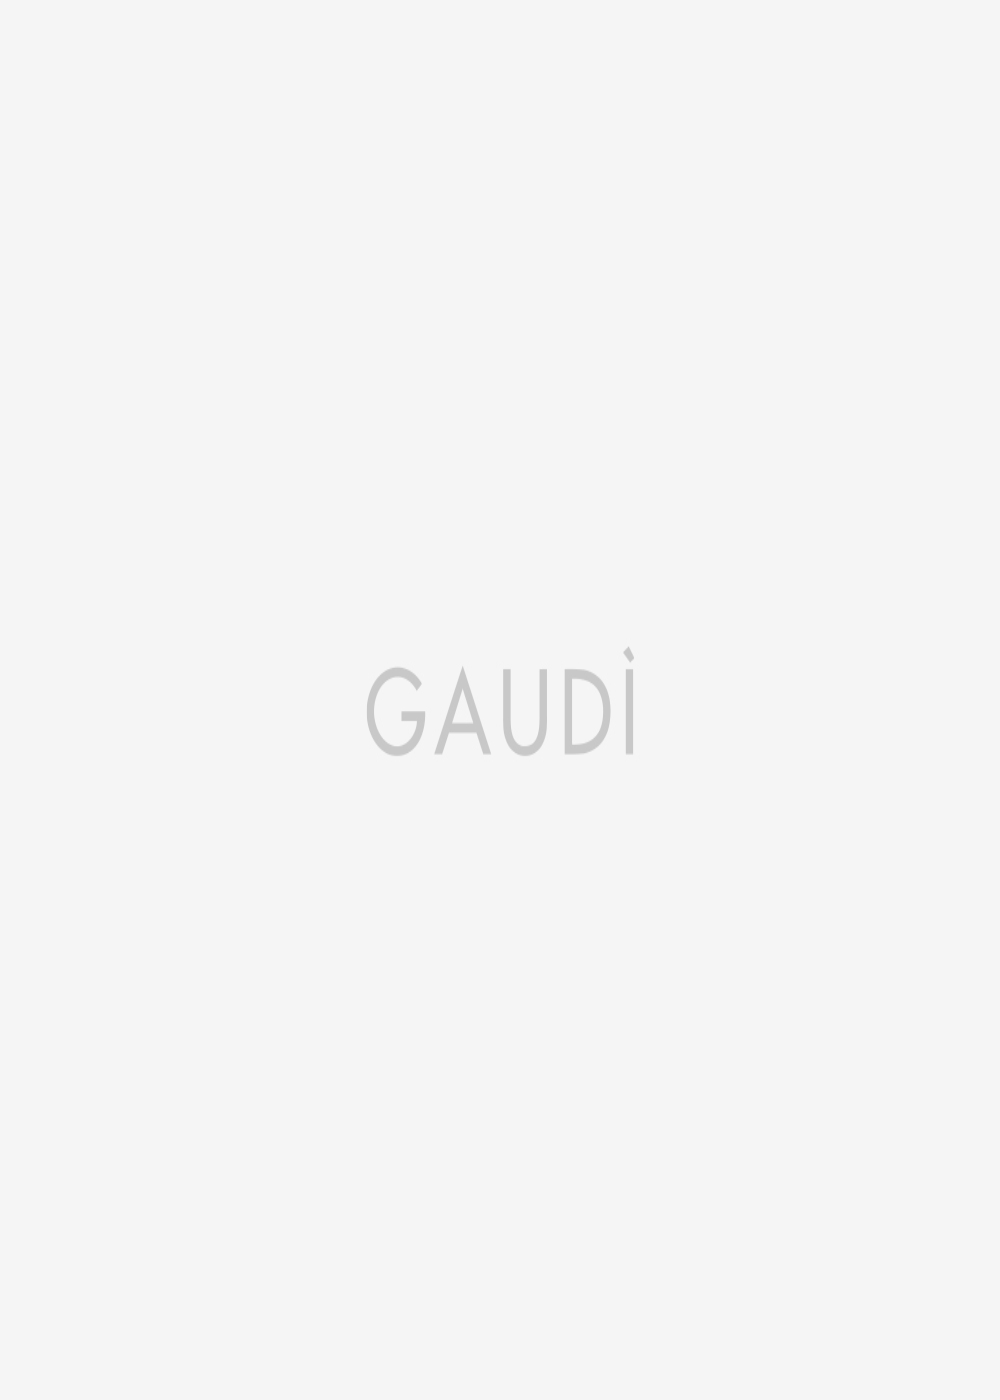 Shirt dress with pockets Gaudì Fashion